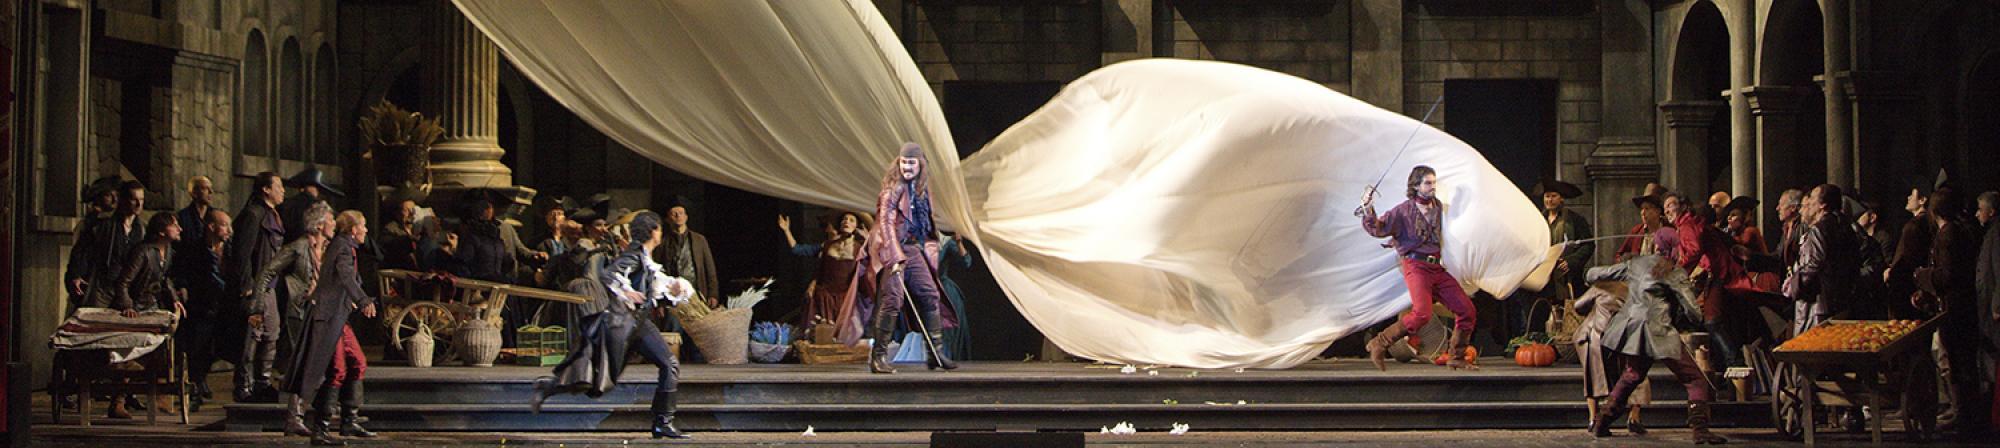 Scene from Met Opera's Romeo et Julliette